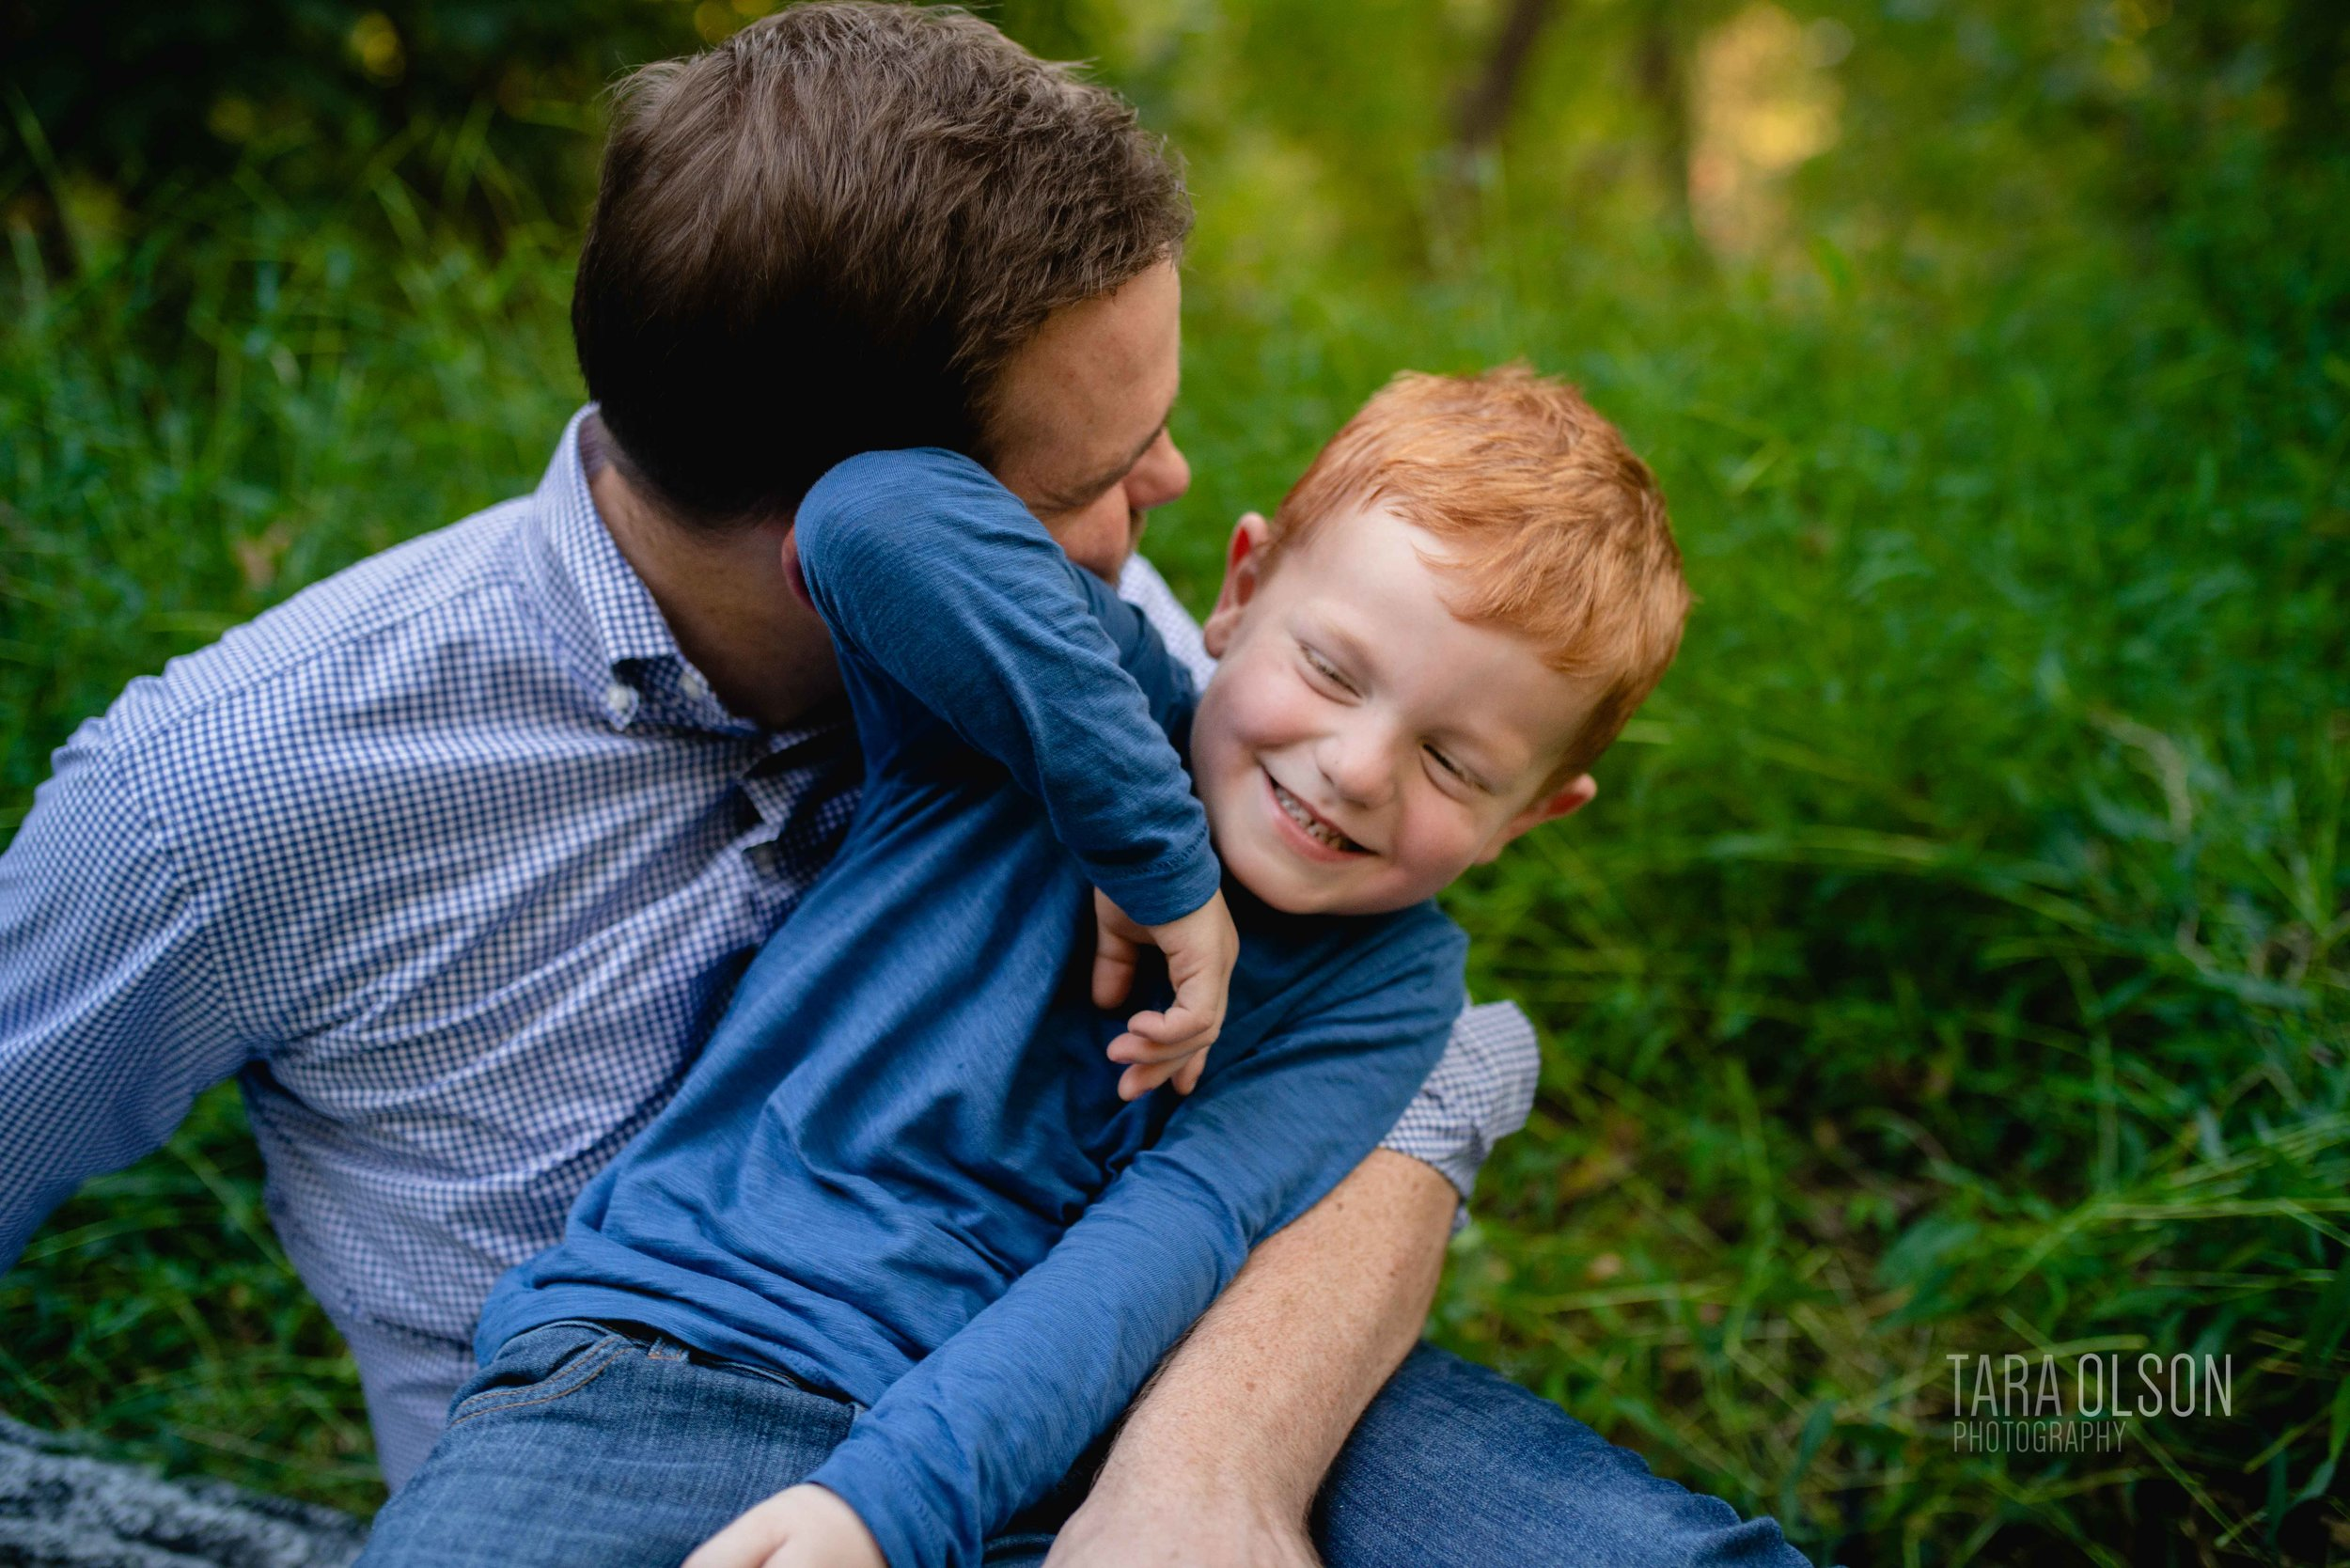 Hawkins_Arlington-Virginia-Family-Photographer_Tara-Olson-Photography_4179.jpg